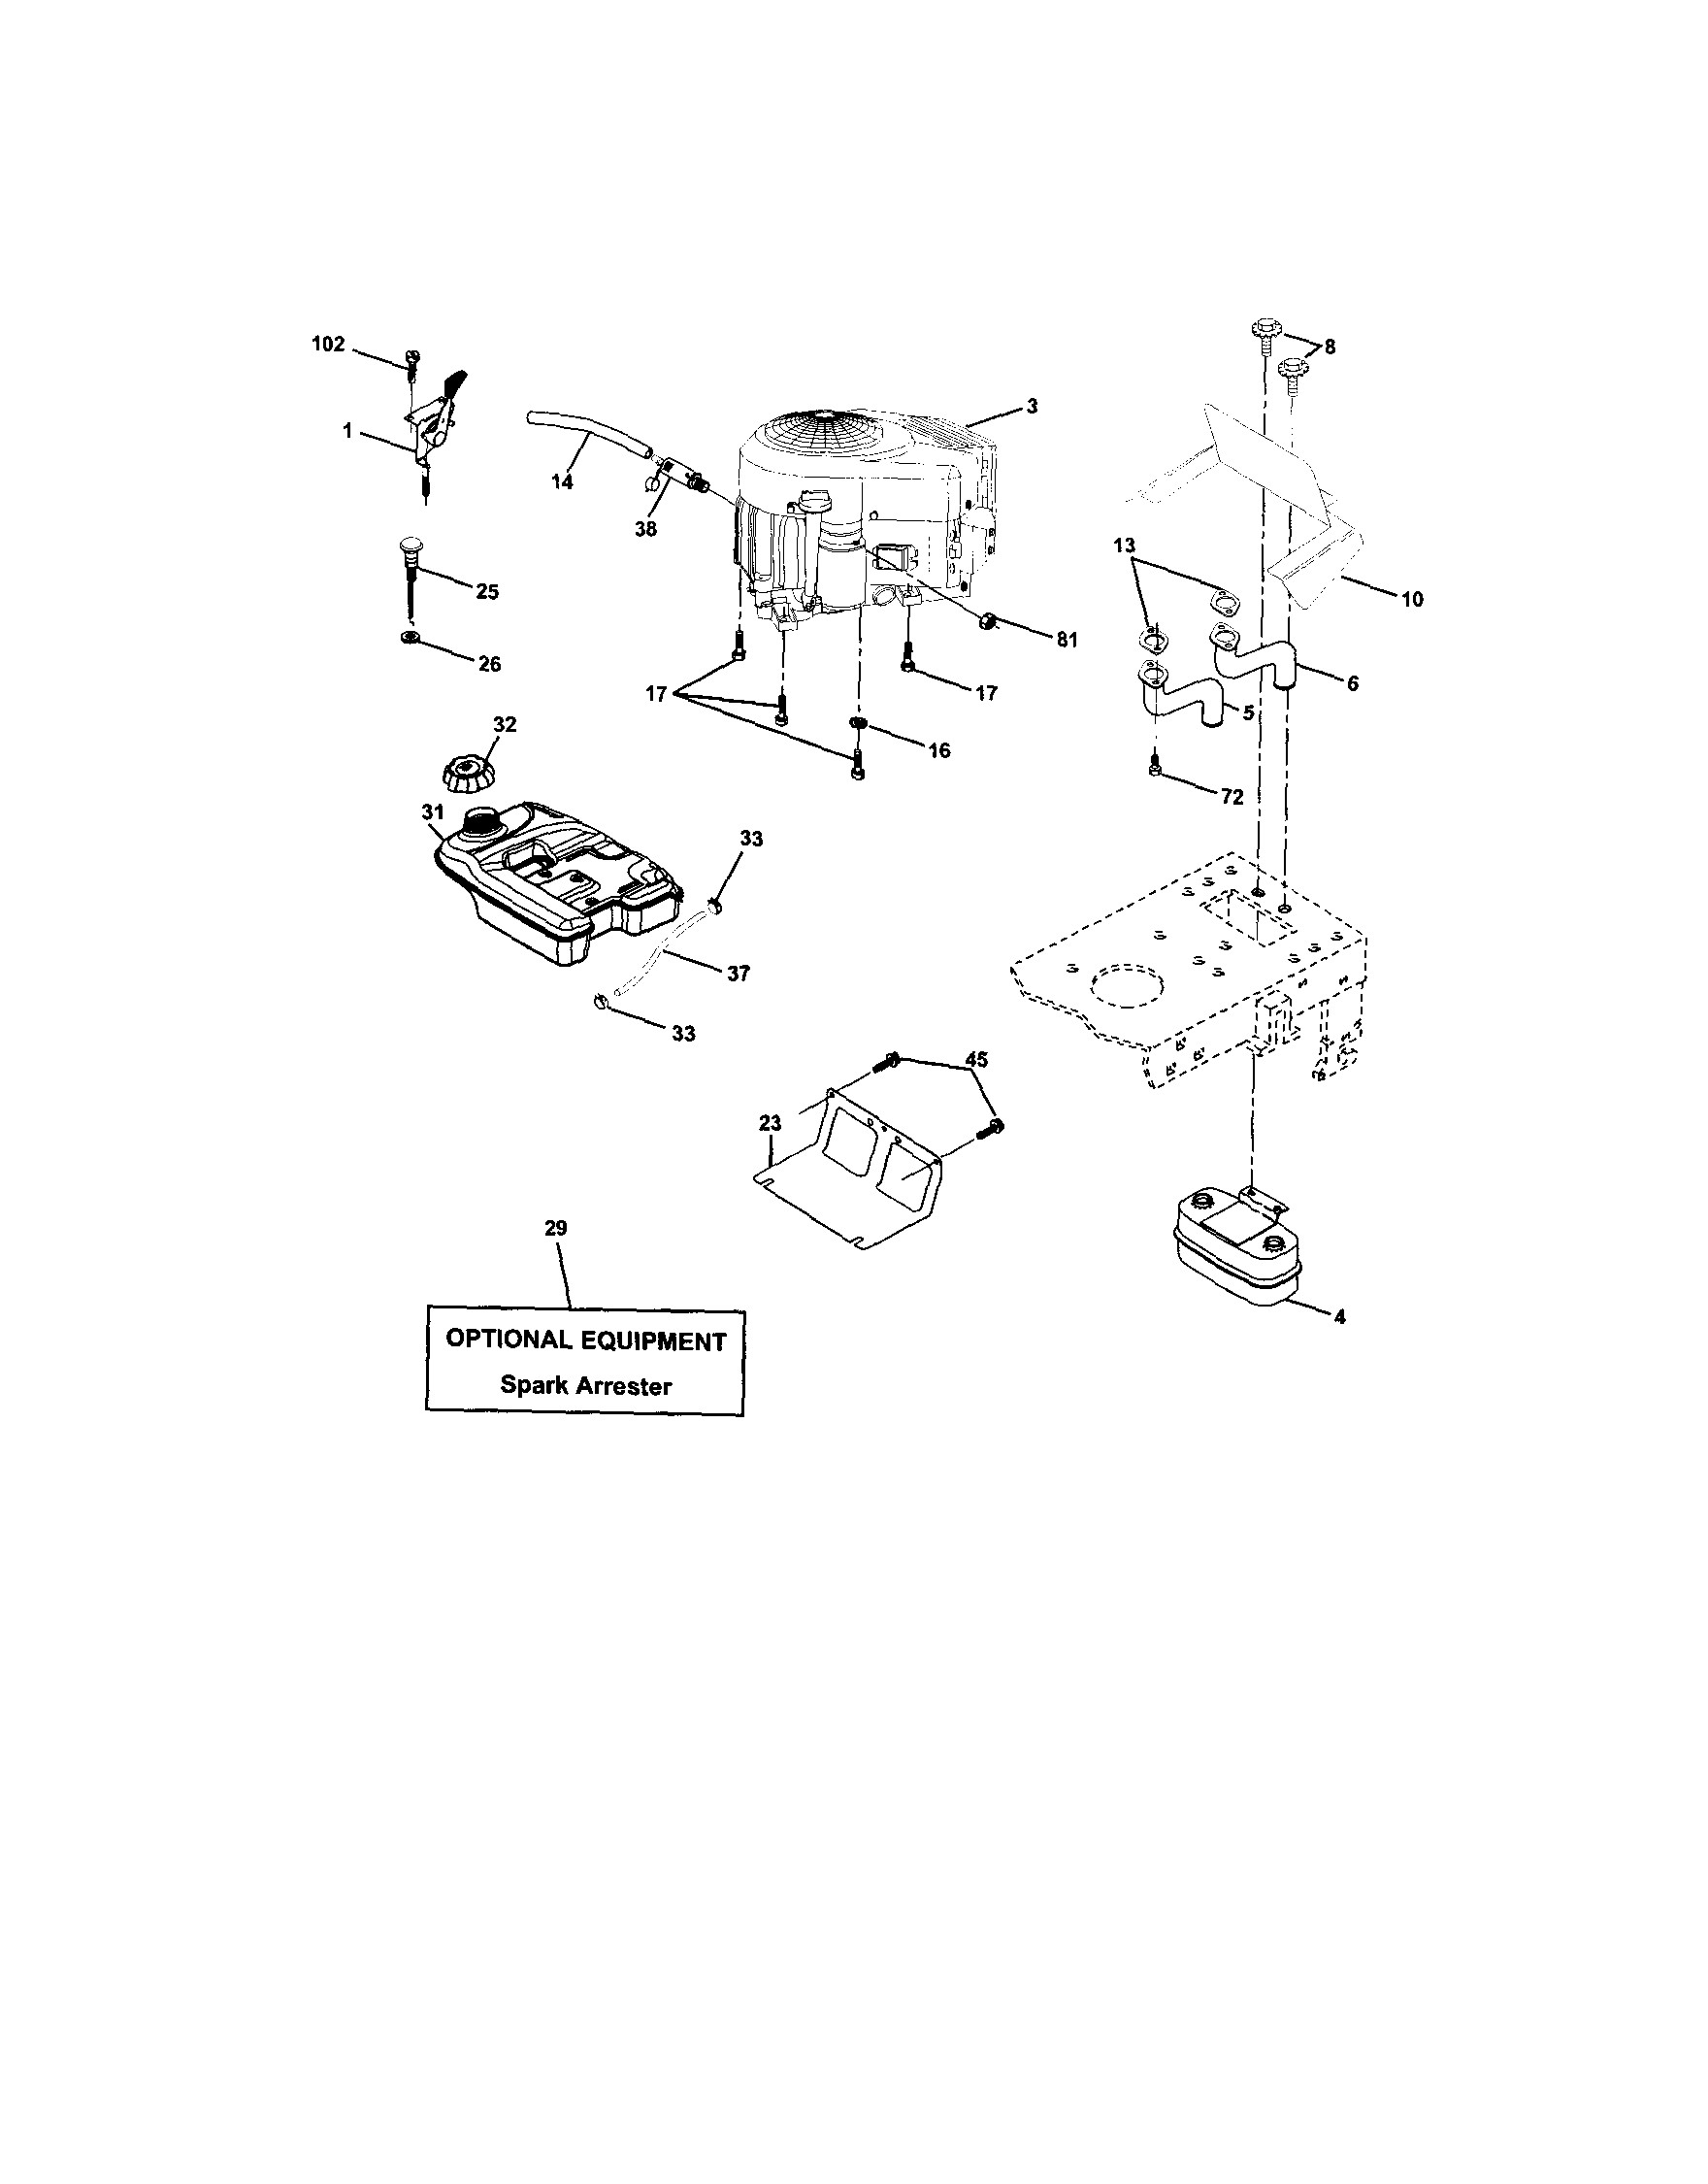 Lawn Mower Engine Parts Diagram Looking for Craftsman Model Front Engine Lawn Of Lawn Mower Engine Parts Diagram